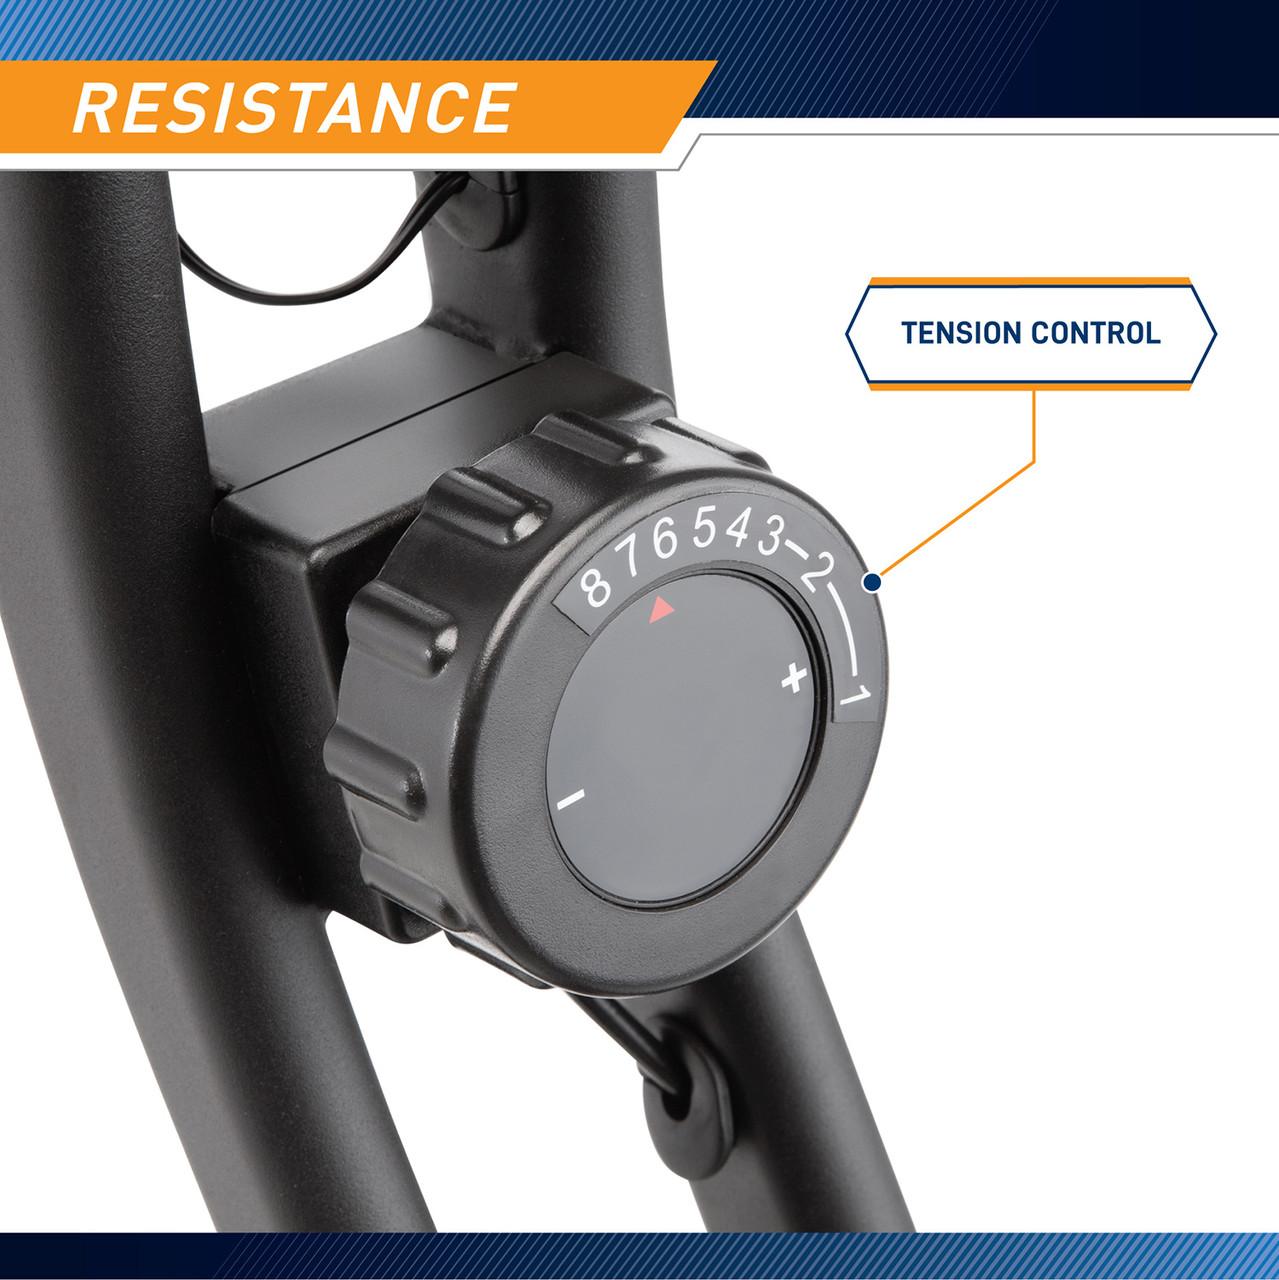 The Foldable NS-654 Bike has an adjustsable tension knob